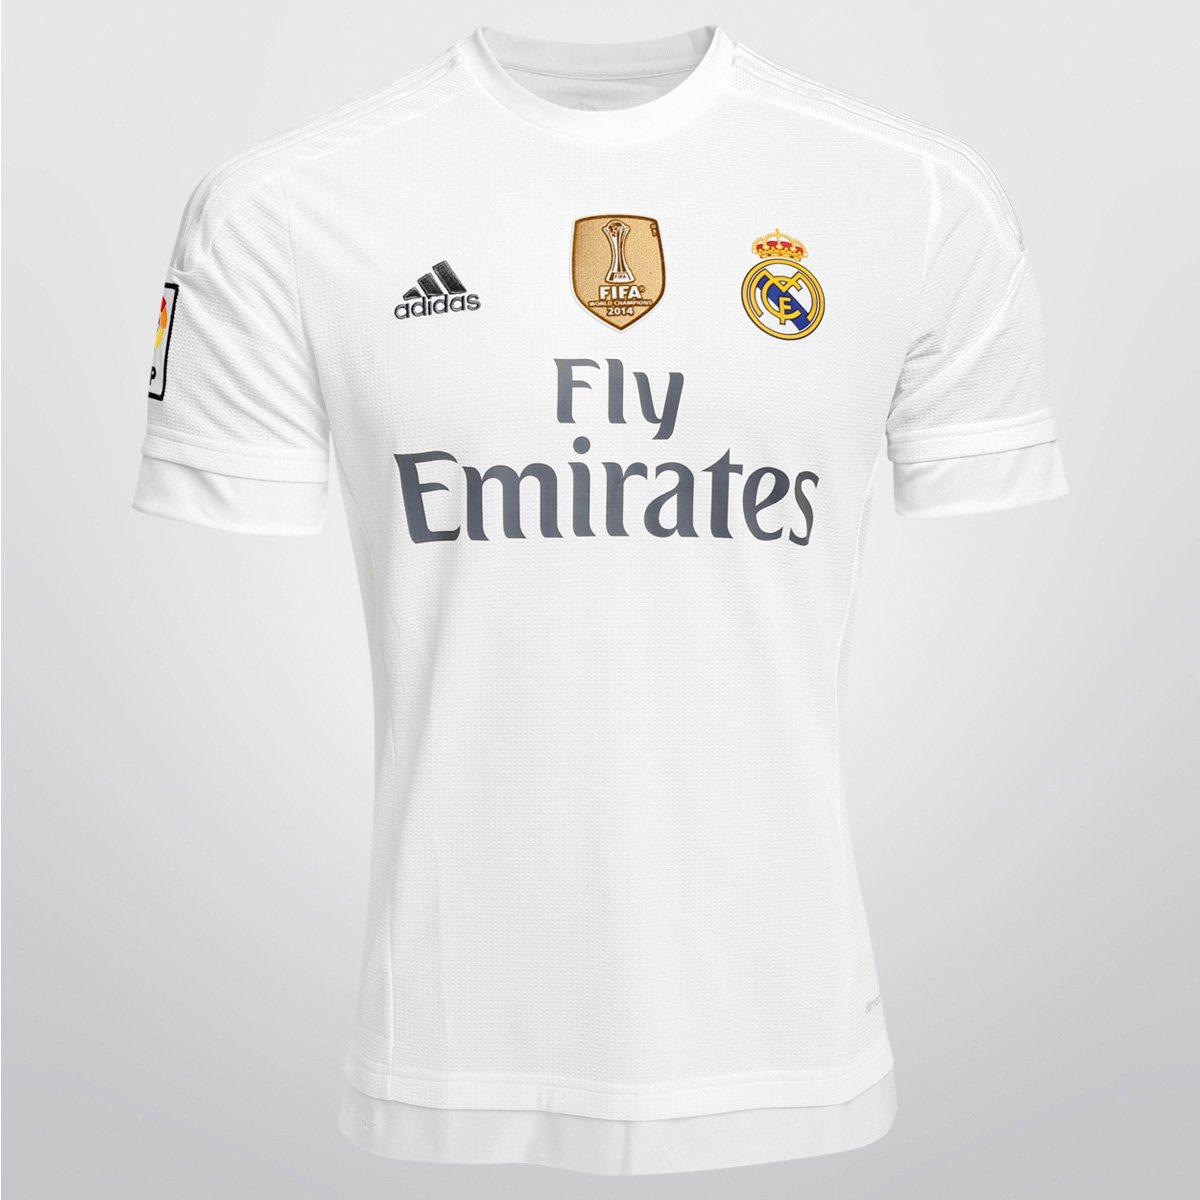 Camisa Adidas Real Madrid Home 15 16 s nº - Patch Mundial - Compre Agora  871f92a993651